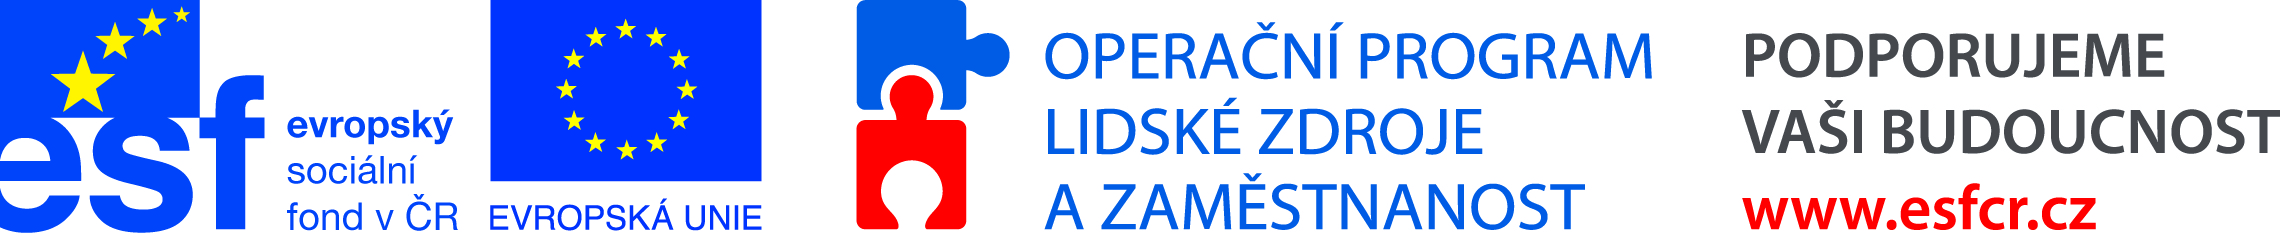 esf_eu_oplzz_podporujeme_horizontal_cmyk_1.jpg